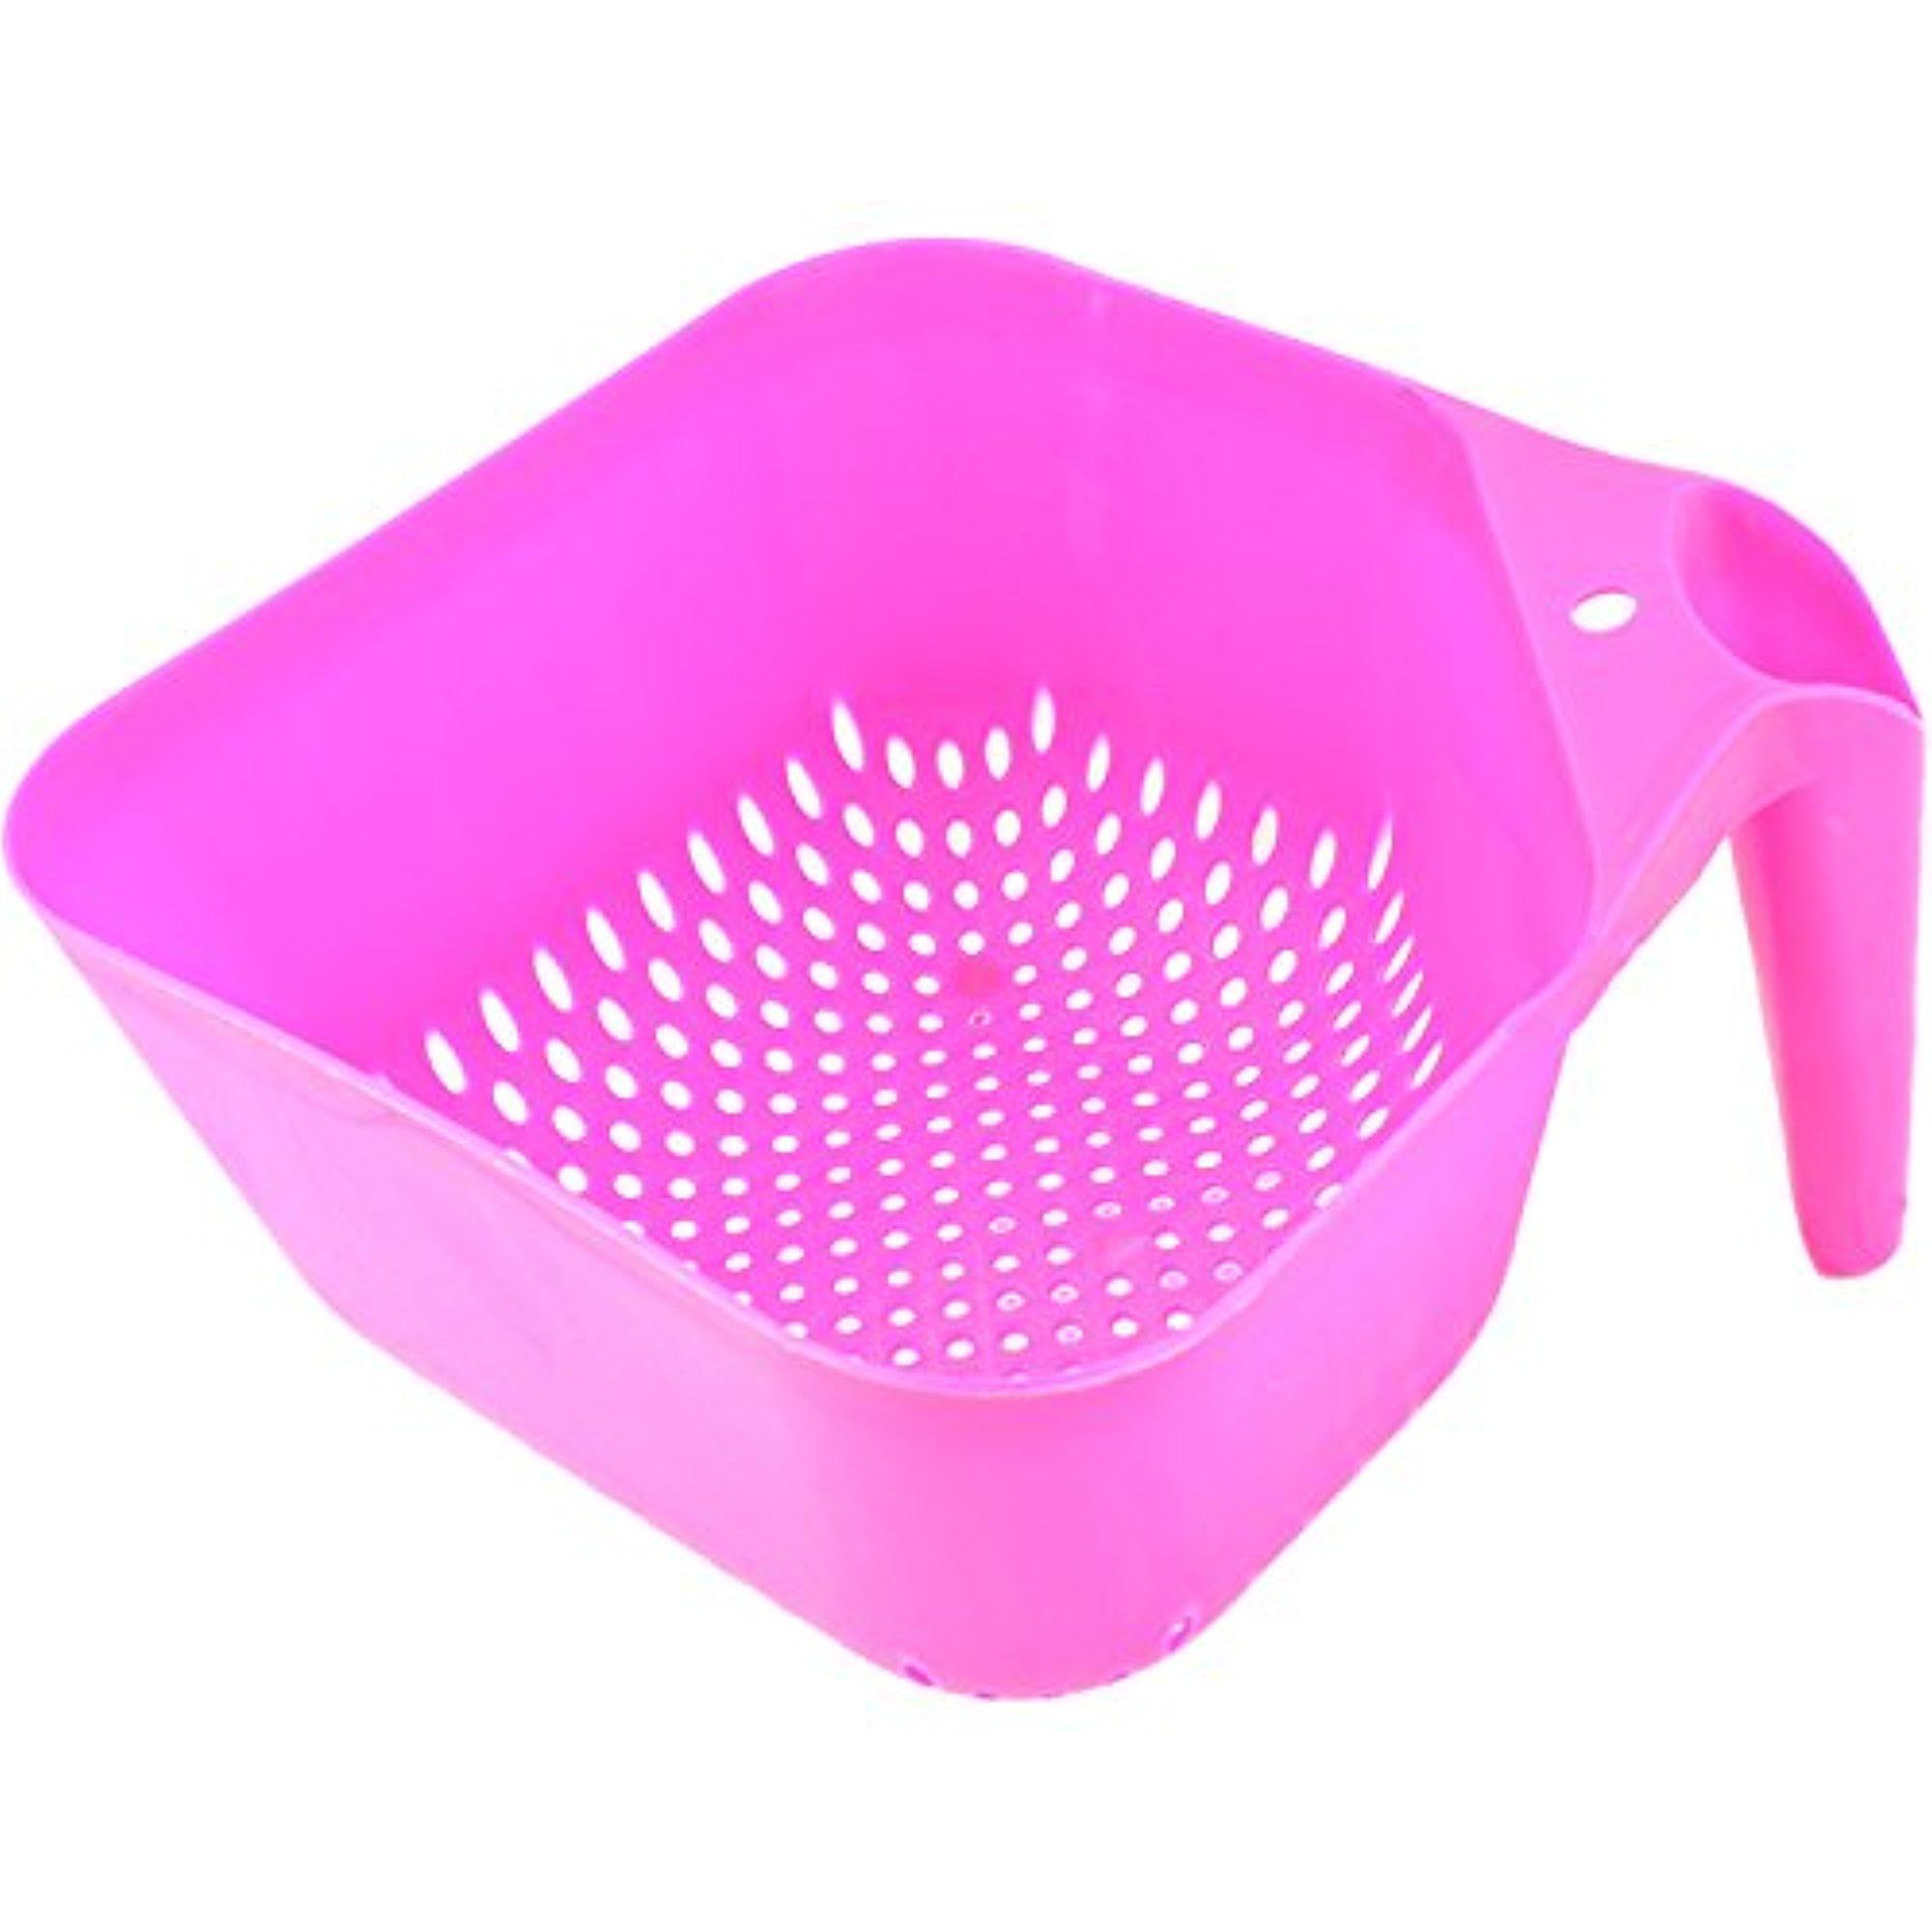 Square Kitchen Colander Strainer with Handle BPA-Free by bogo Brands (Pink) by bogo Brands